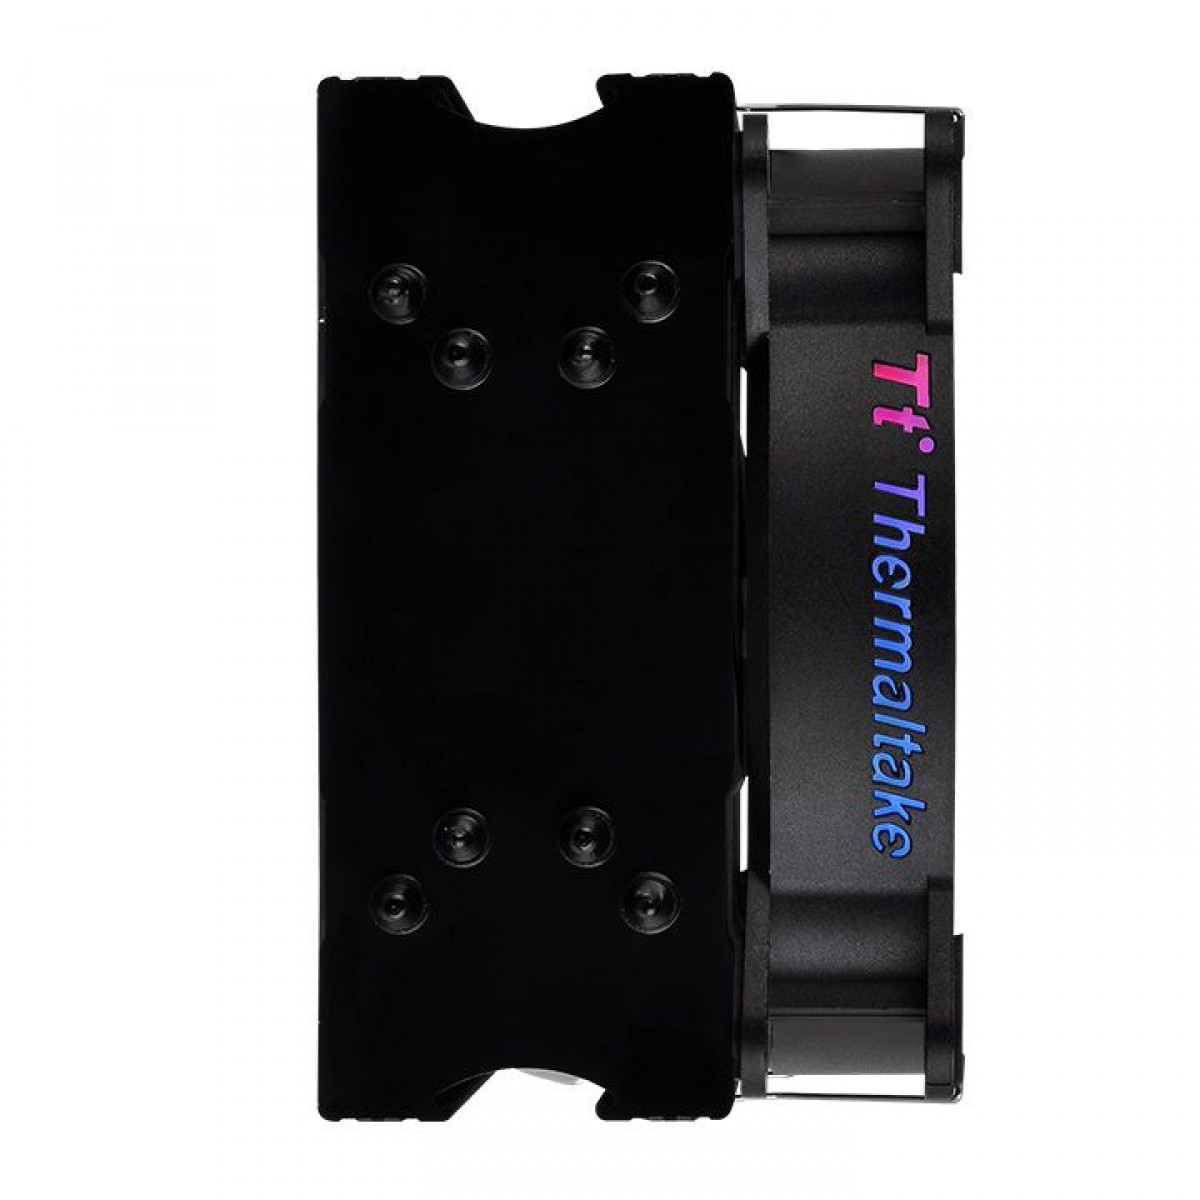 Cooler para Processador Thermaltake UX200 ARGB Lighting, 120mm, Intel-AMD, CL-P065-AL12SW-A